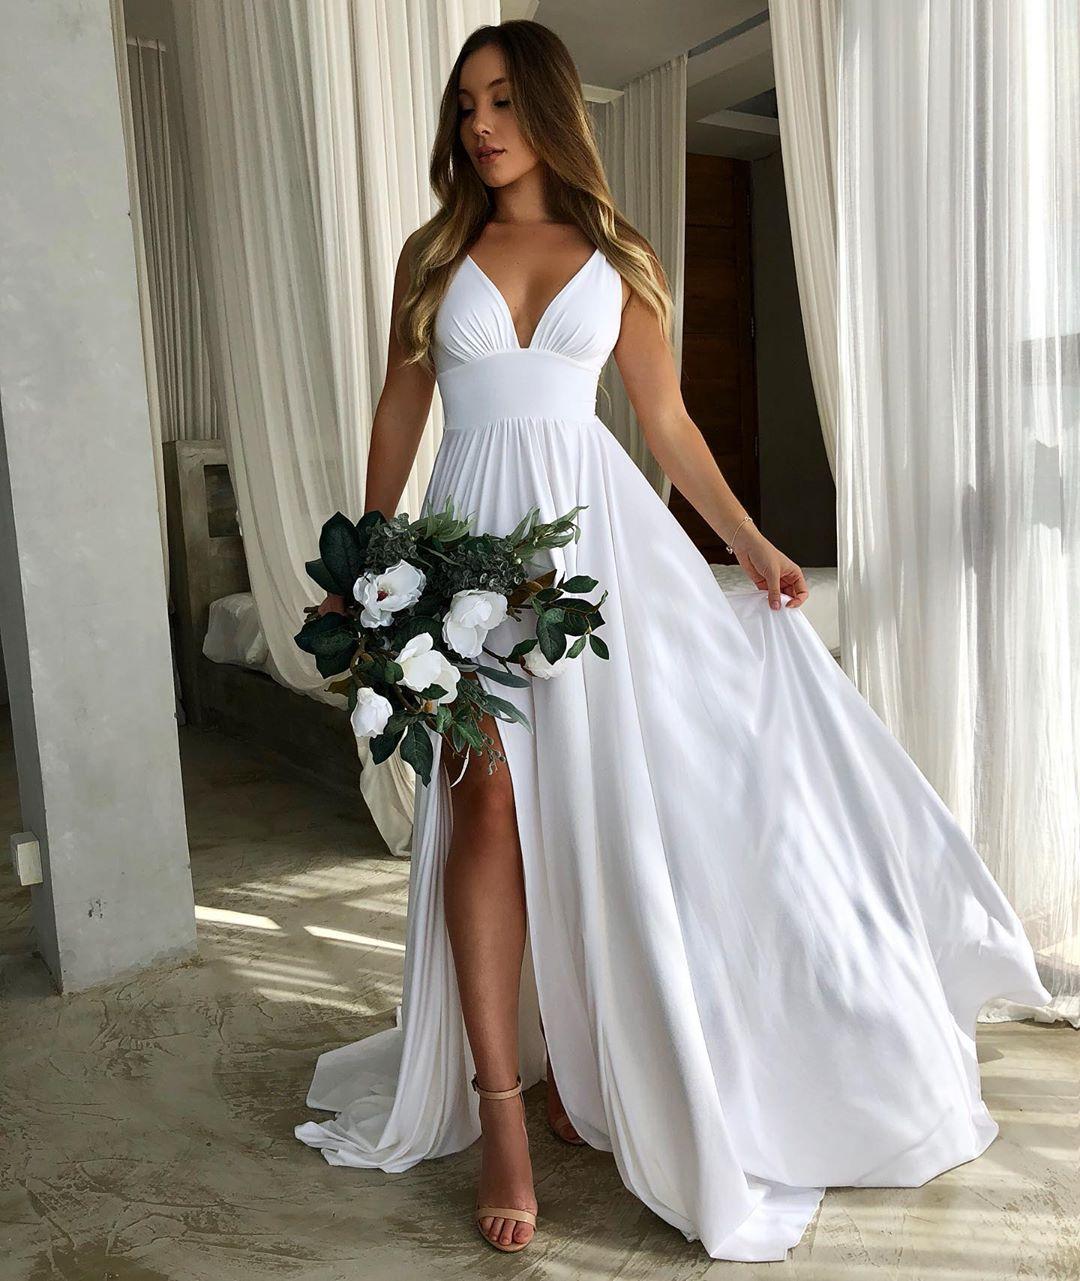 Bohemian Summer Beach Wedding Dress A Line Sexy Spaghetti Straps V Neck Plus Size Simple Women Bridal Gowns Wedding Dresses Aliexpress,Formal Dresses For Wedding Guest Plus Size